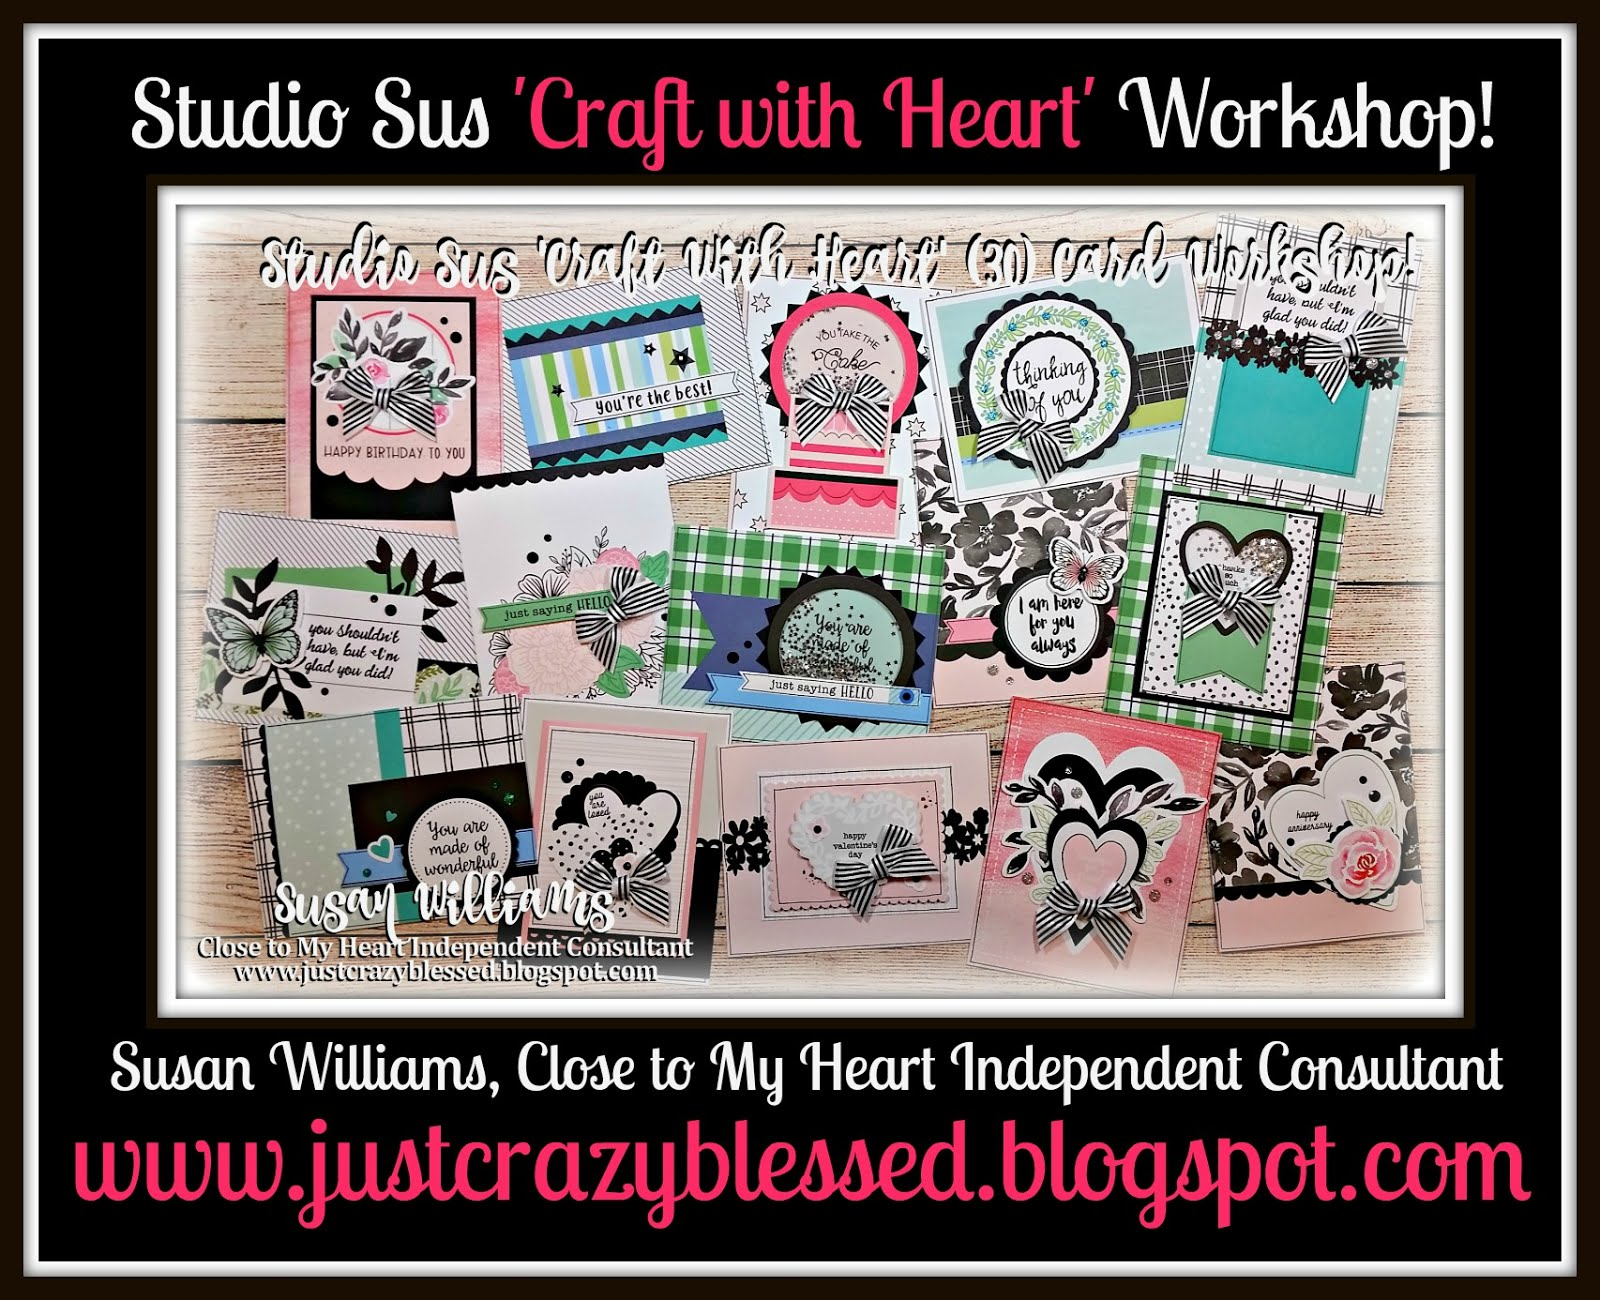 Craft with Heart Cardmaking Workshop!